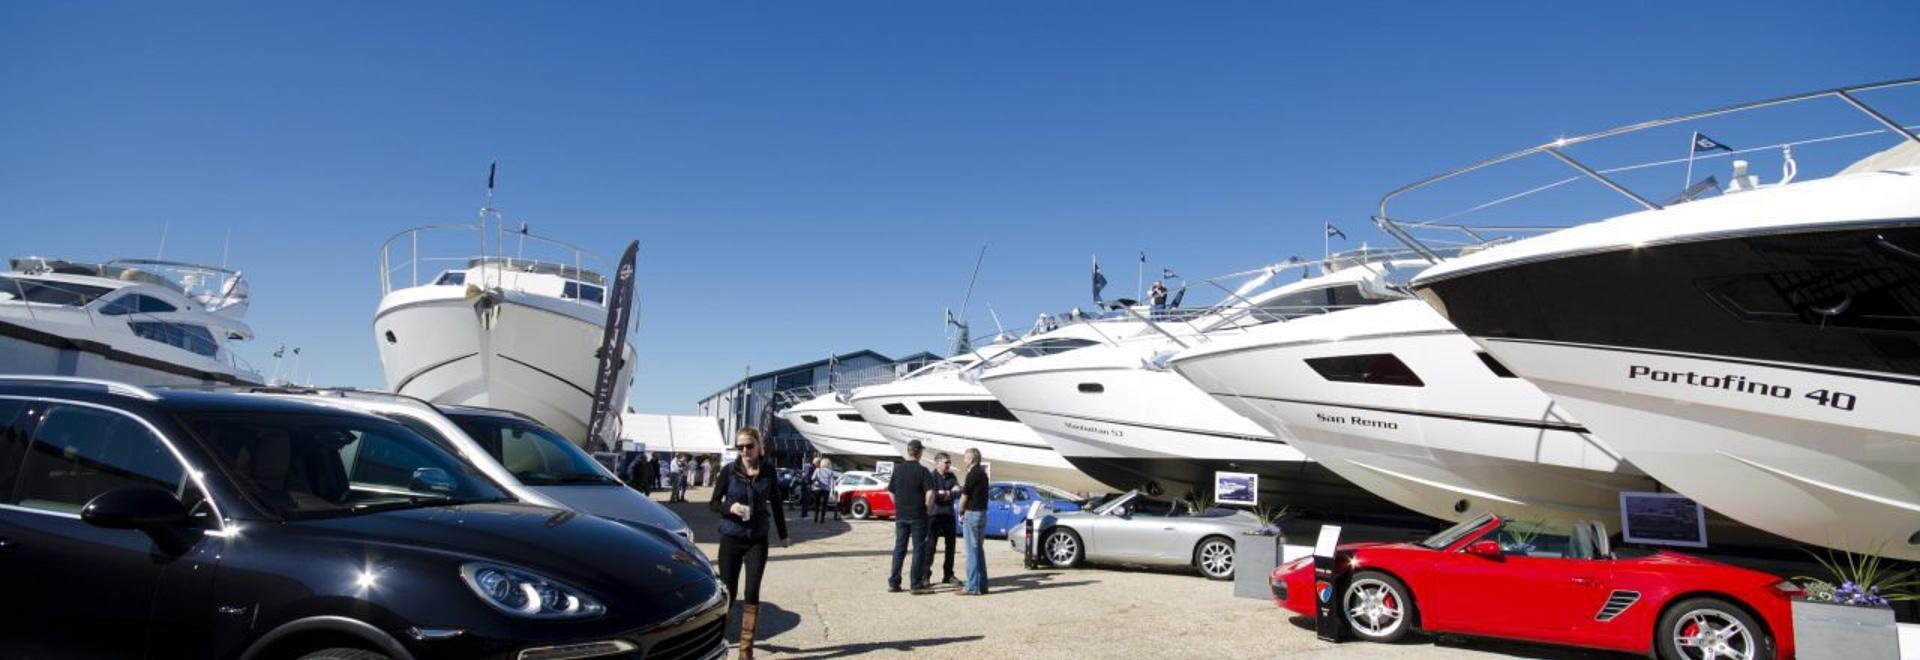 Sunseeker pre-season boat show opens on Friday 10 March in Poole